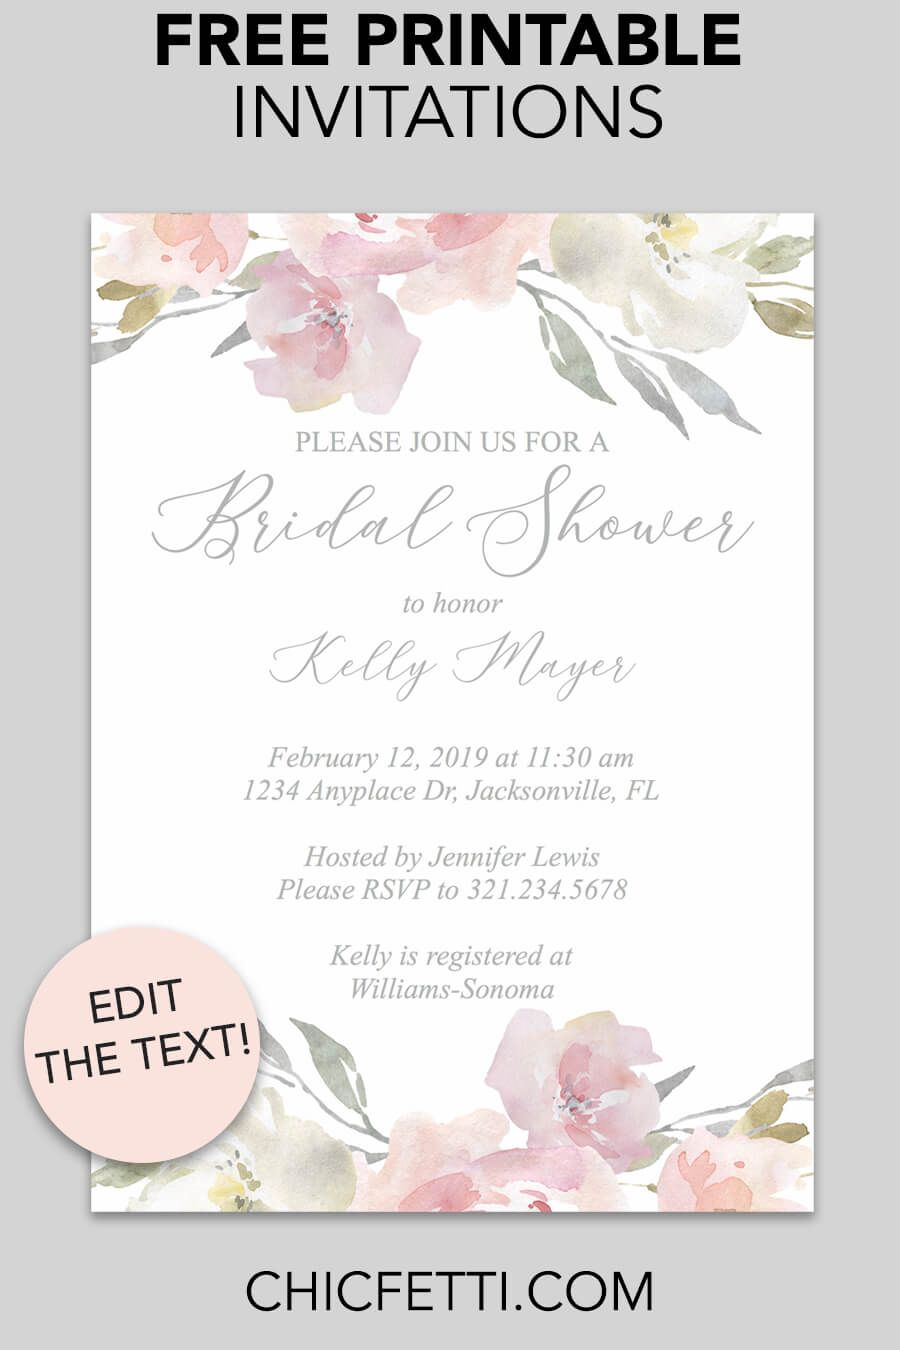 Bridal Shower Printable Invitation Blush Floral Invitations inside measurements 900 X 1350